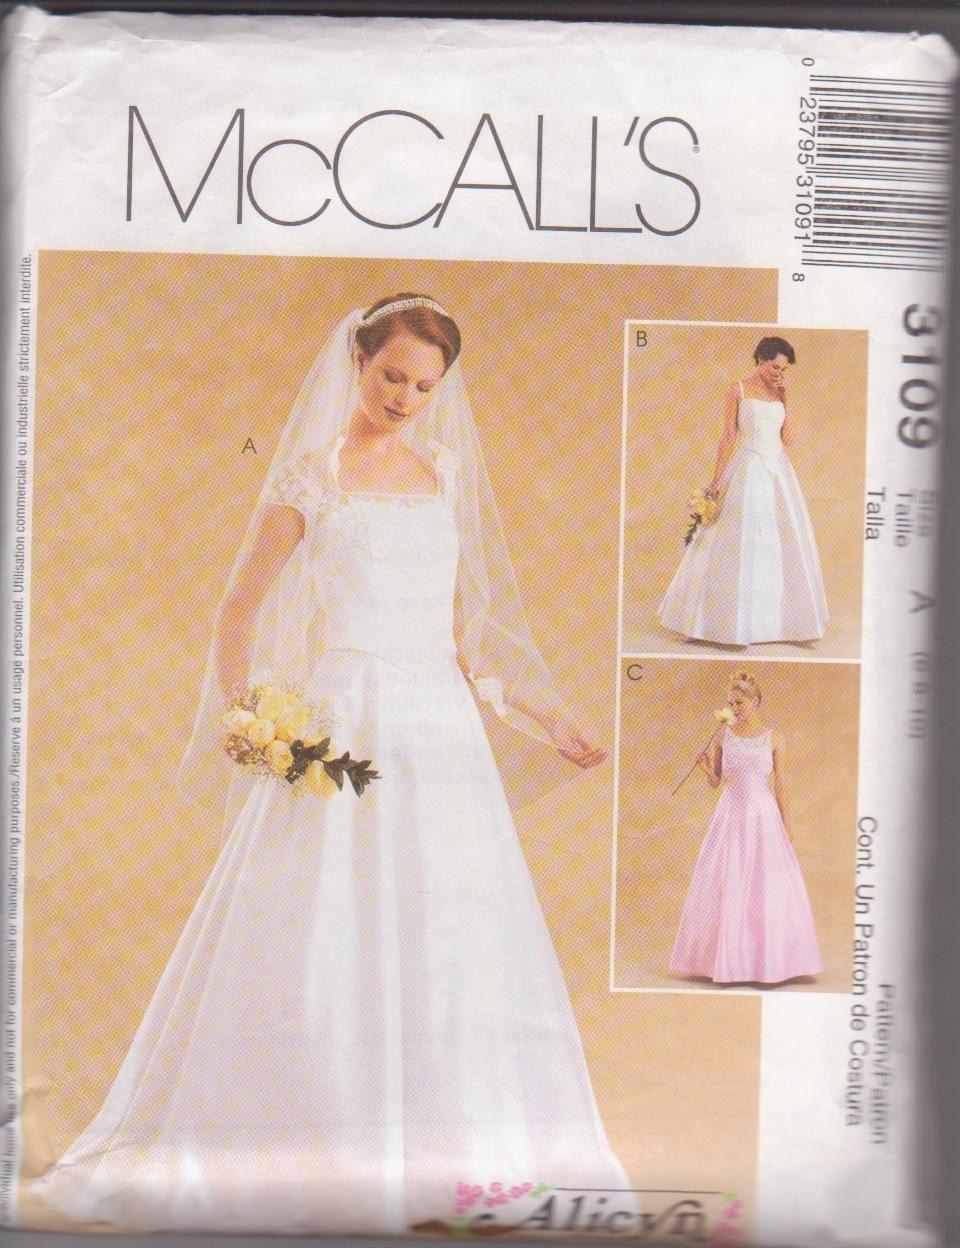 Mccall 39 s alicyn wedding gown dress pattern 3109 size for Wedding dress patterns mccalls